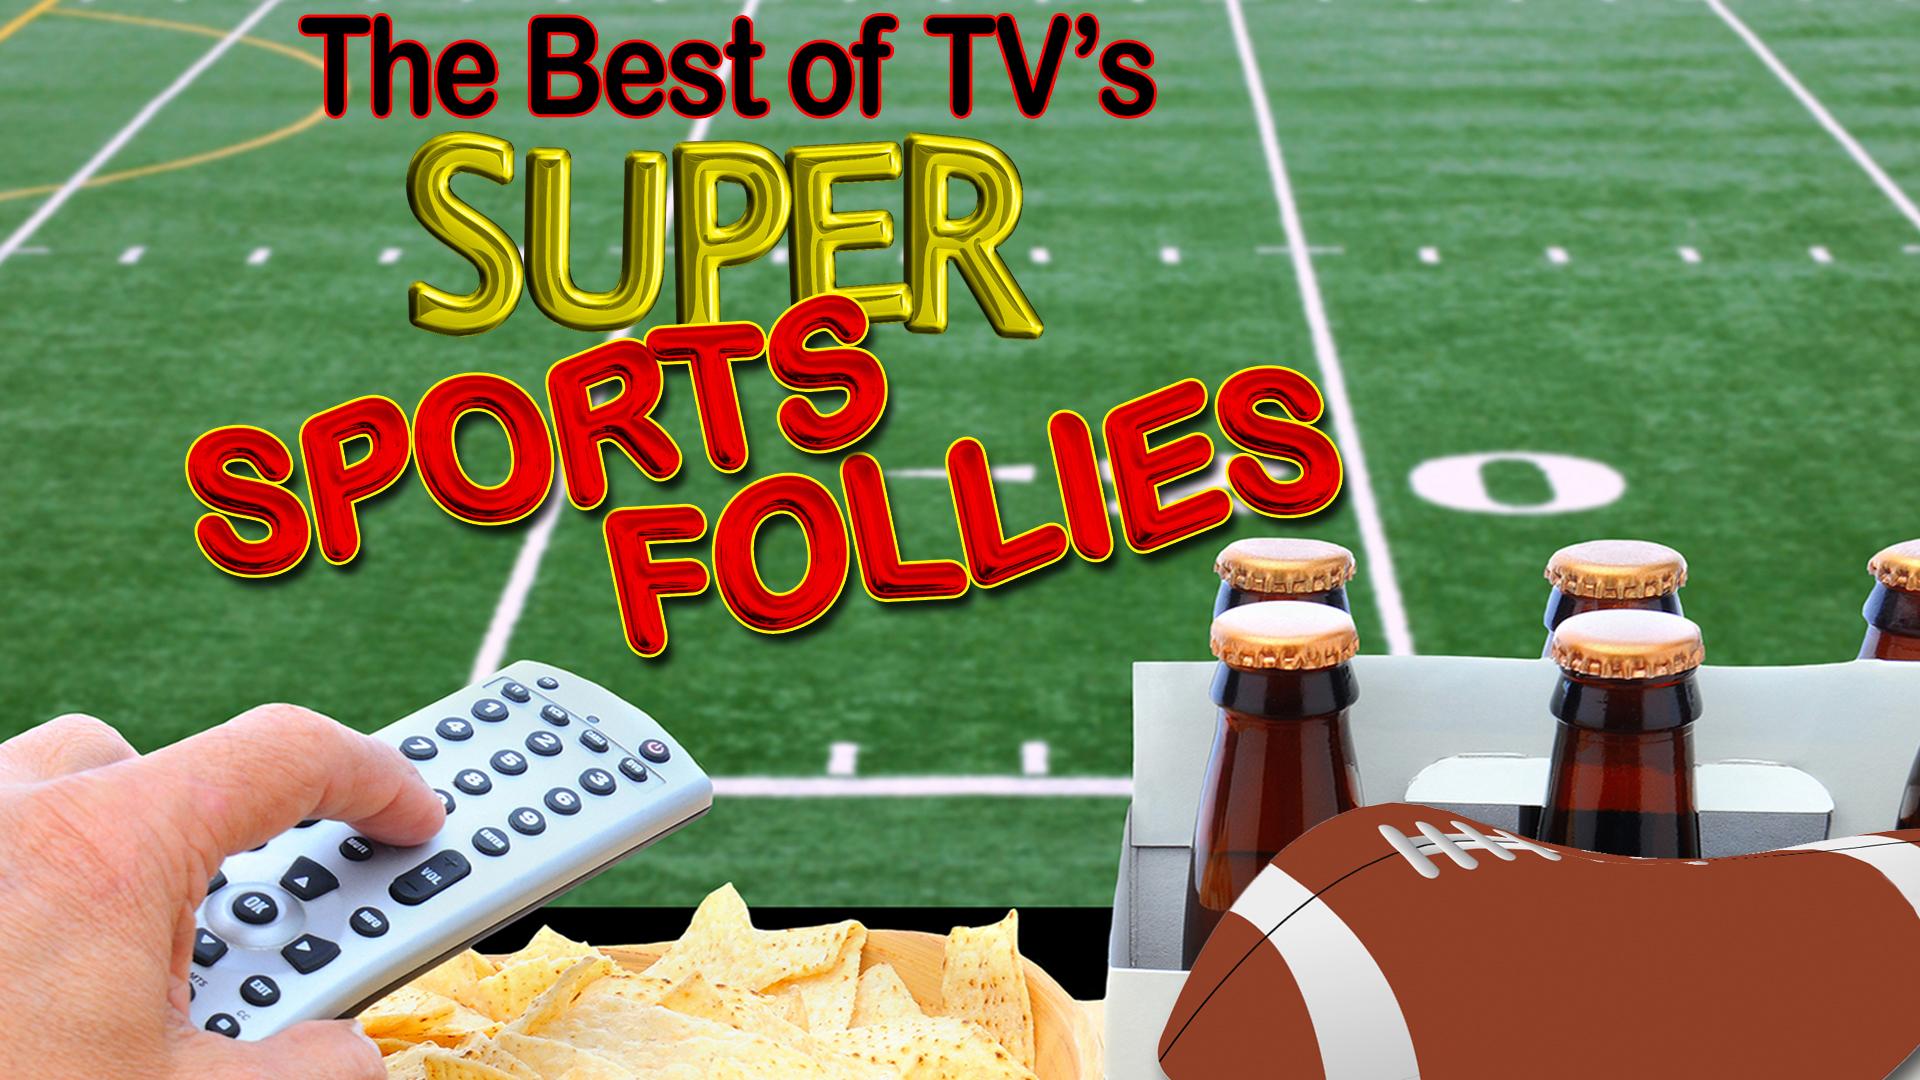 The Best of TV's Super Sports Follies -